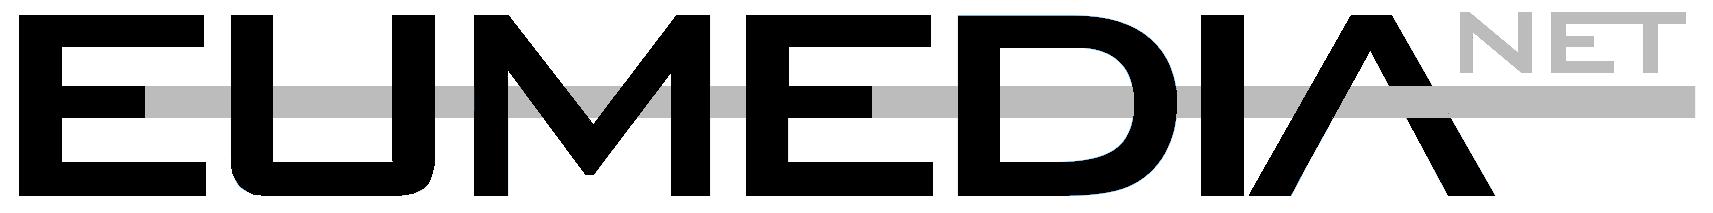 EUMEDIANET